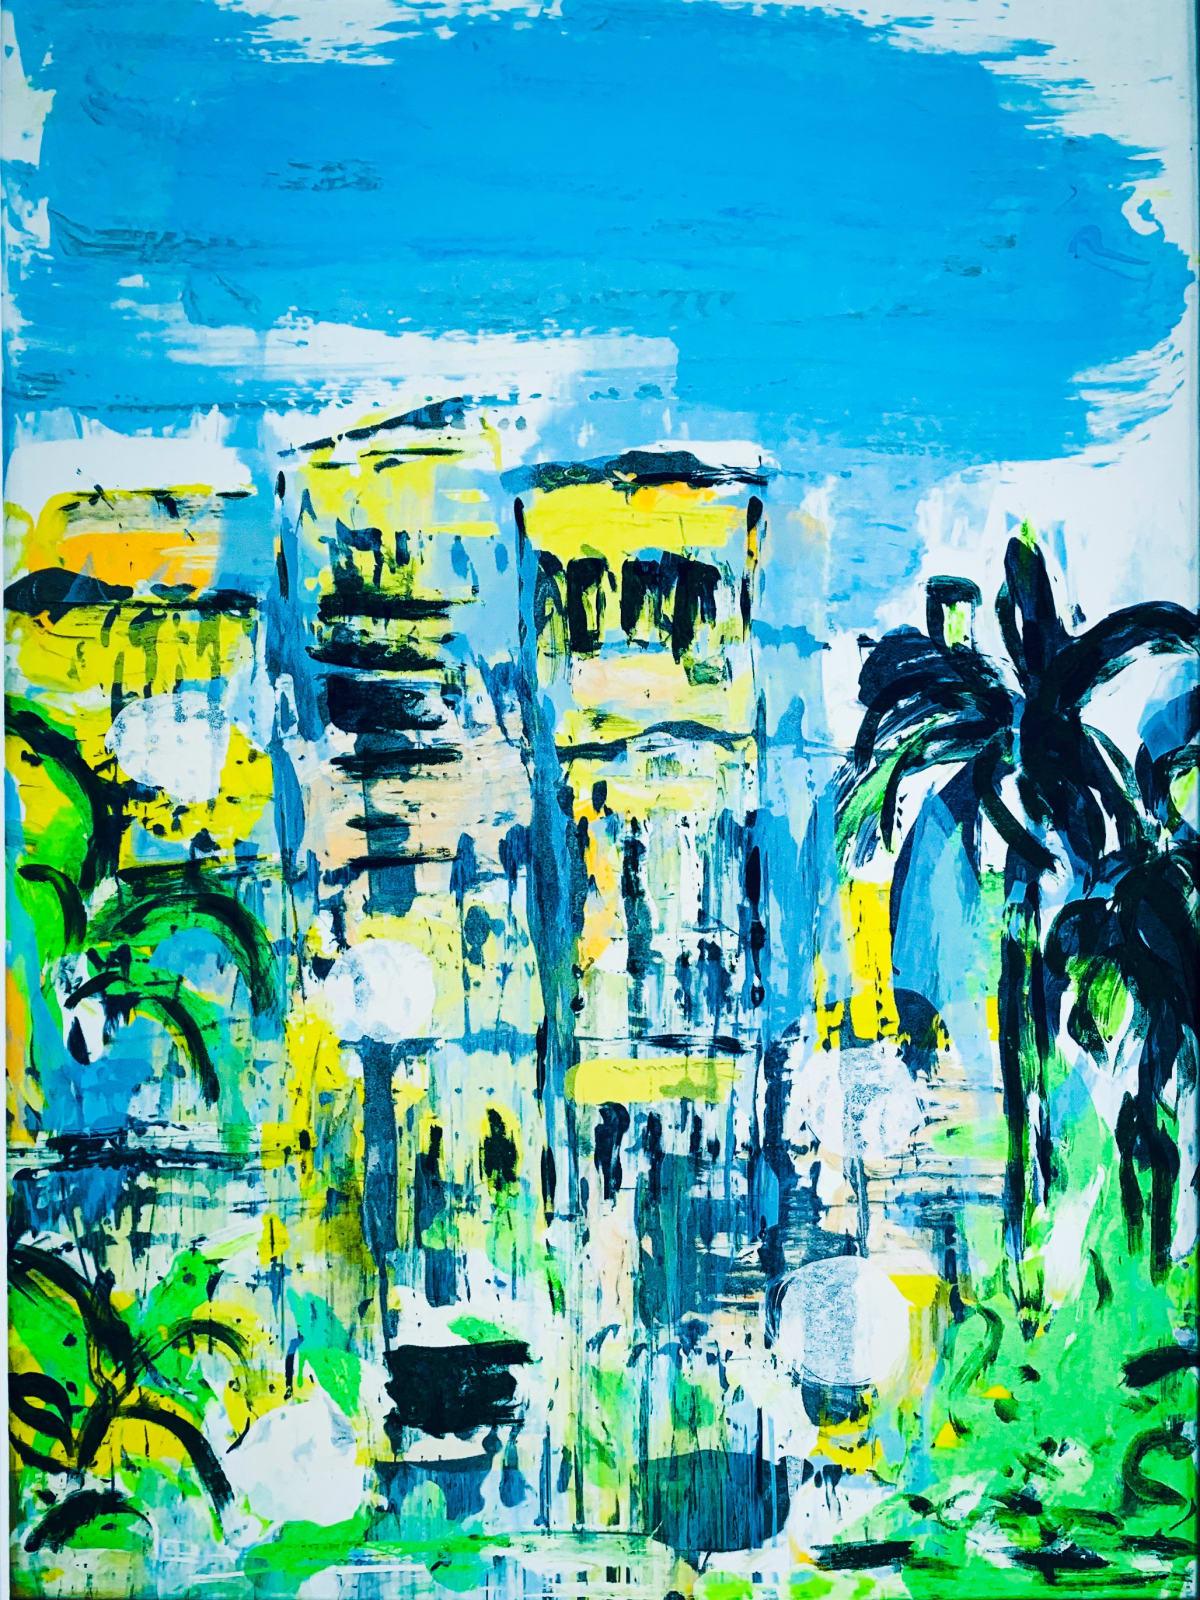 Putney School of Art and Design, Kira Behnert, Summer in the City